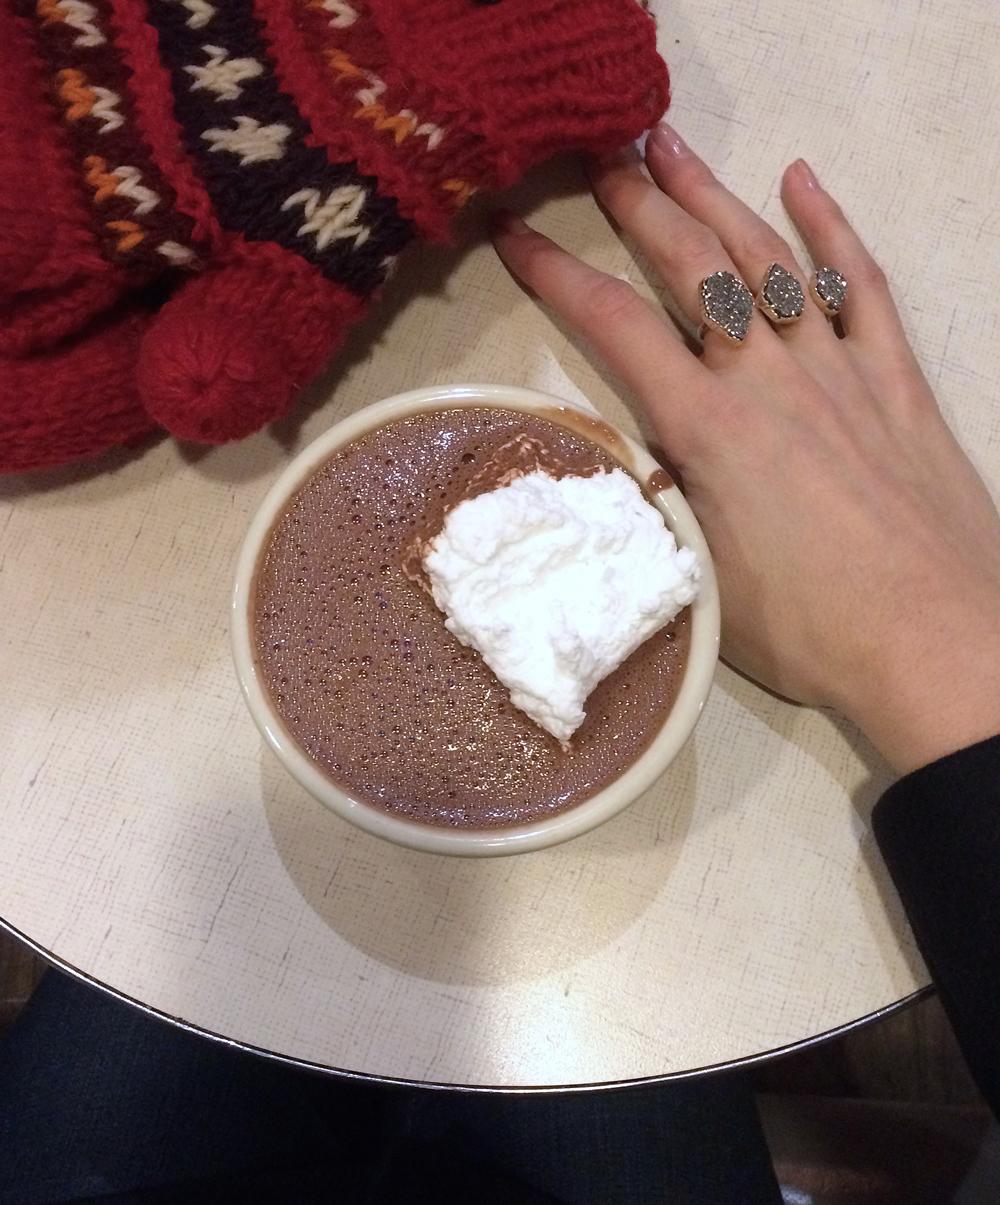 City-Bakery-hot-chocolate.jpg